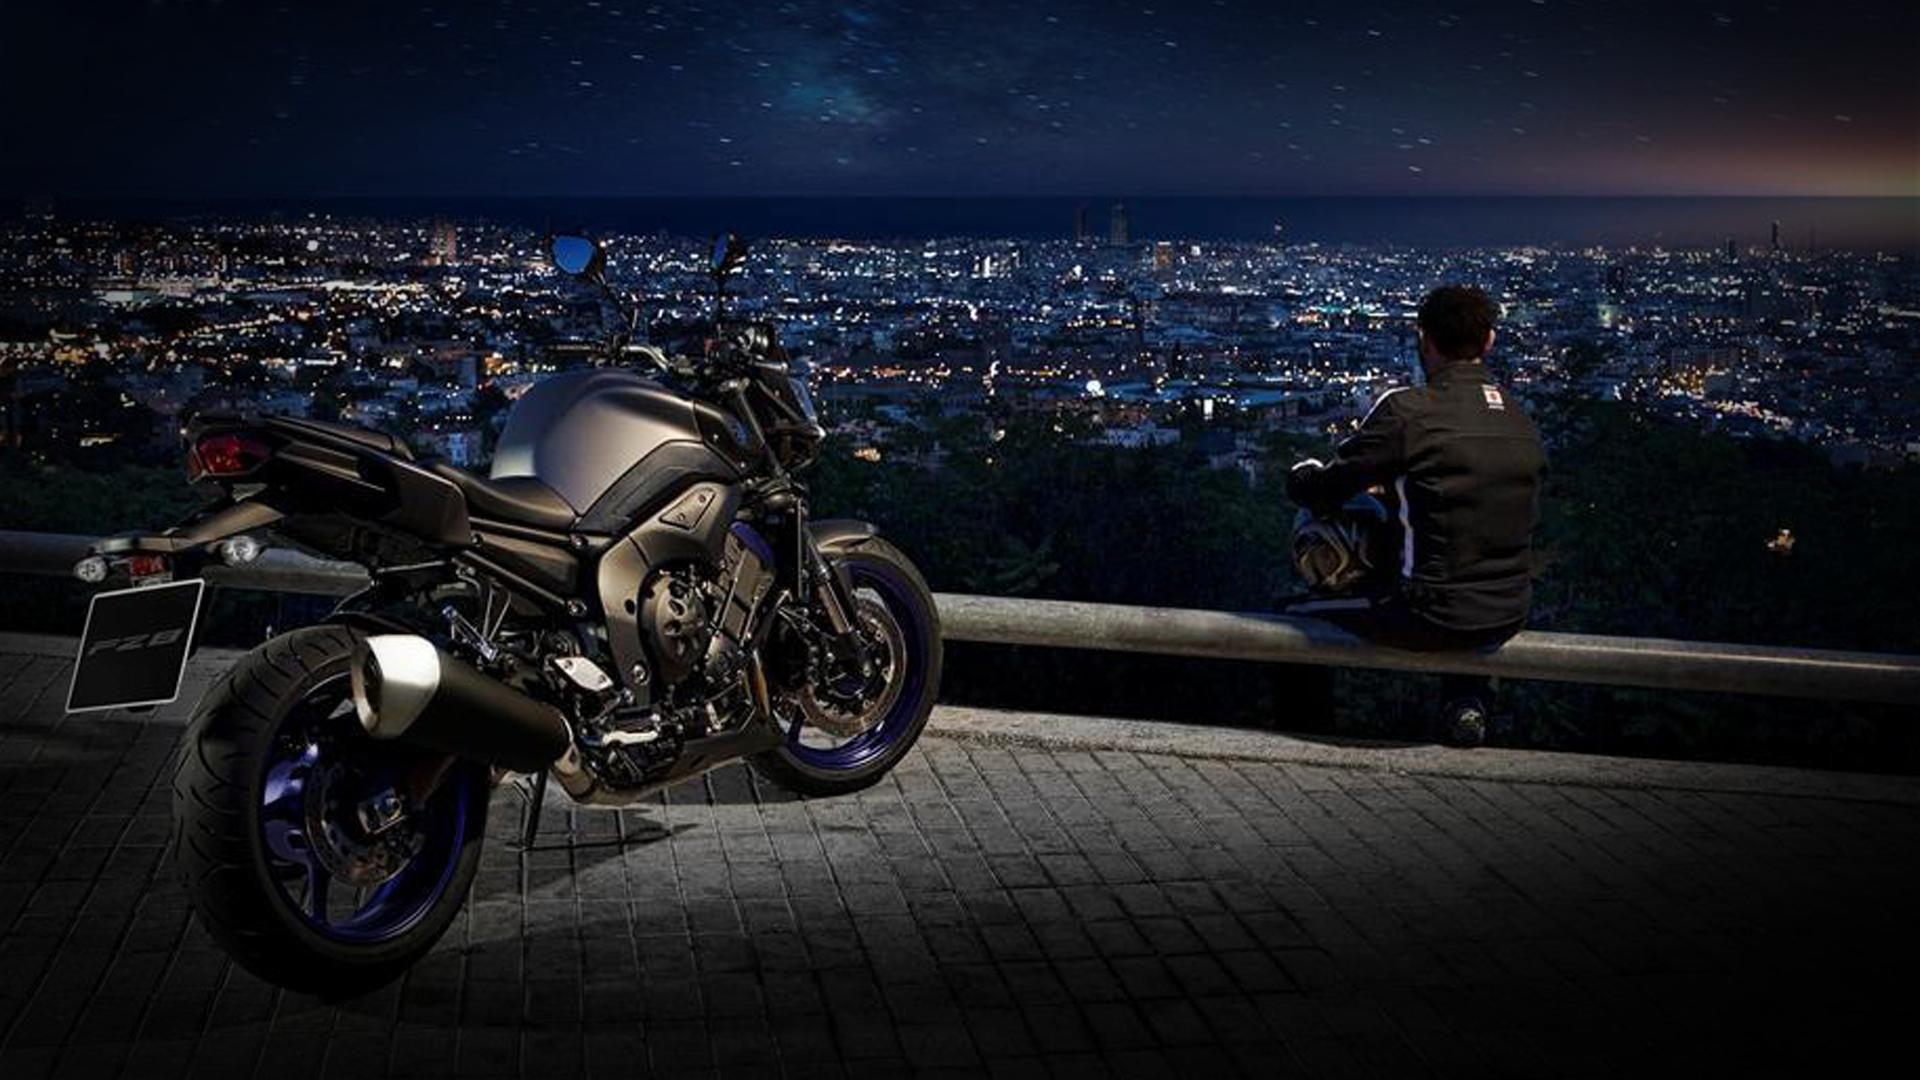 2014 Yamaha FZ8 engine performance 2014 Yamaha FZ8 Naket Brutal 1920x1080